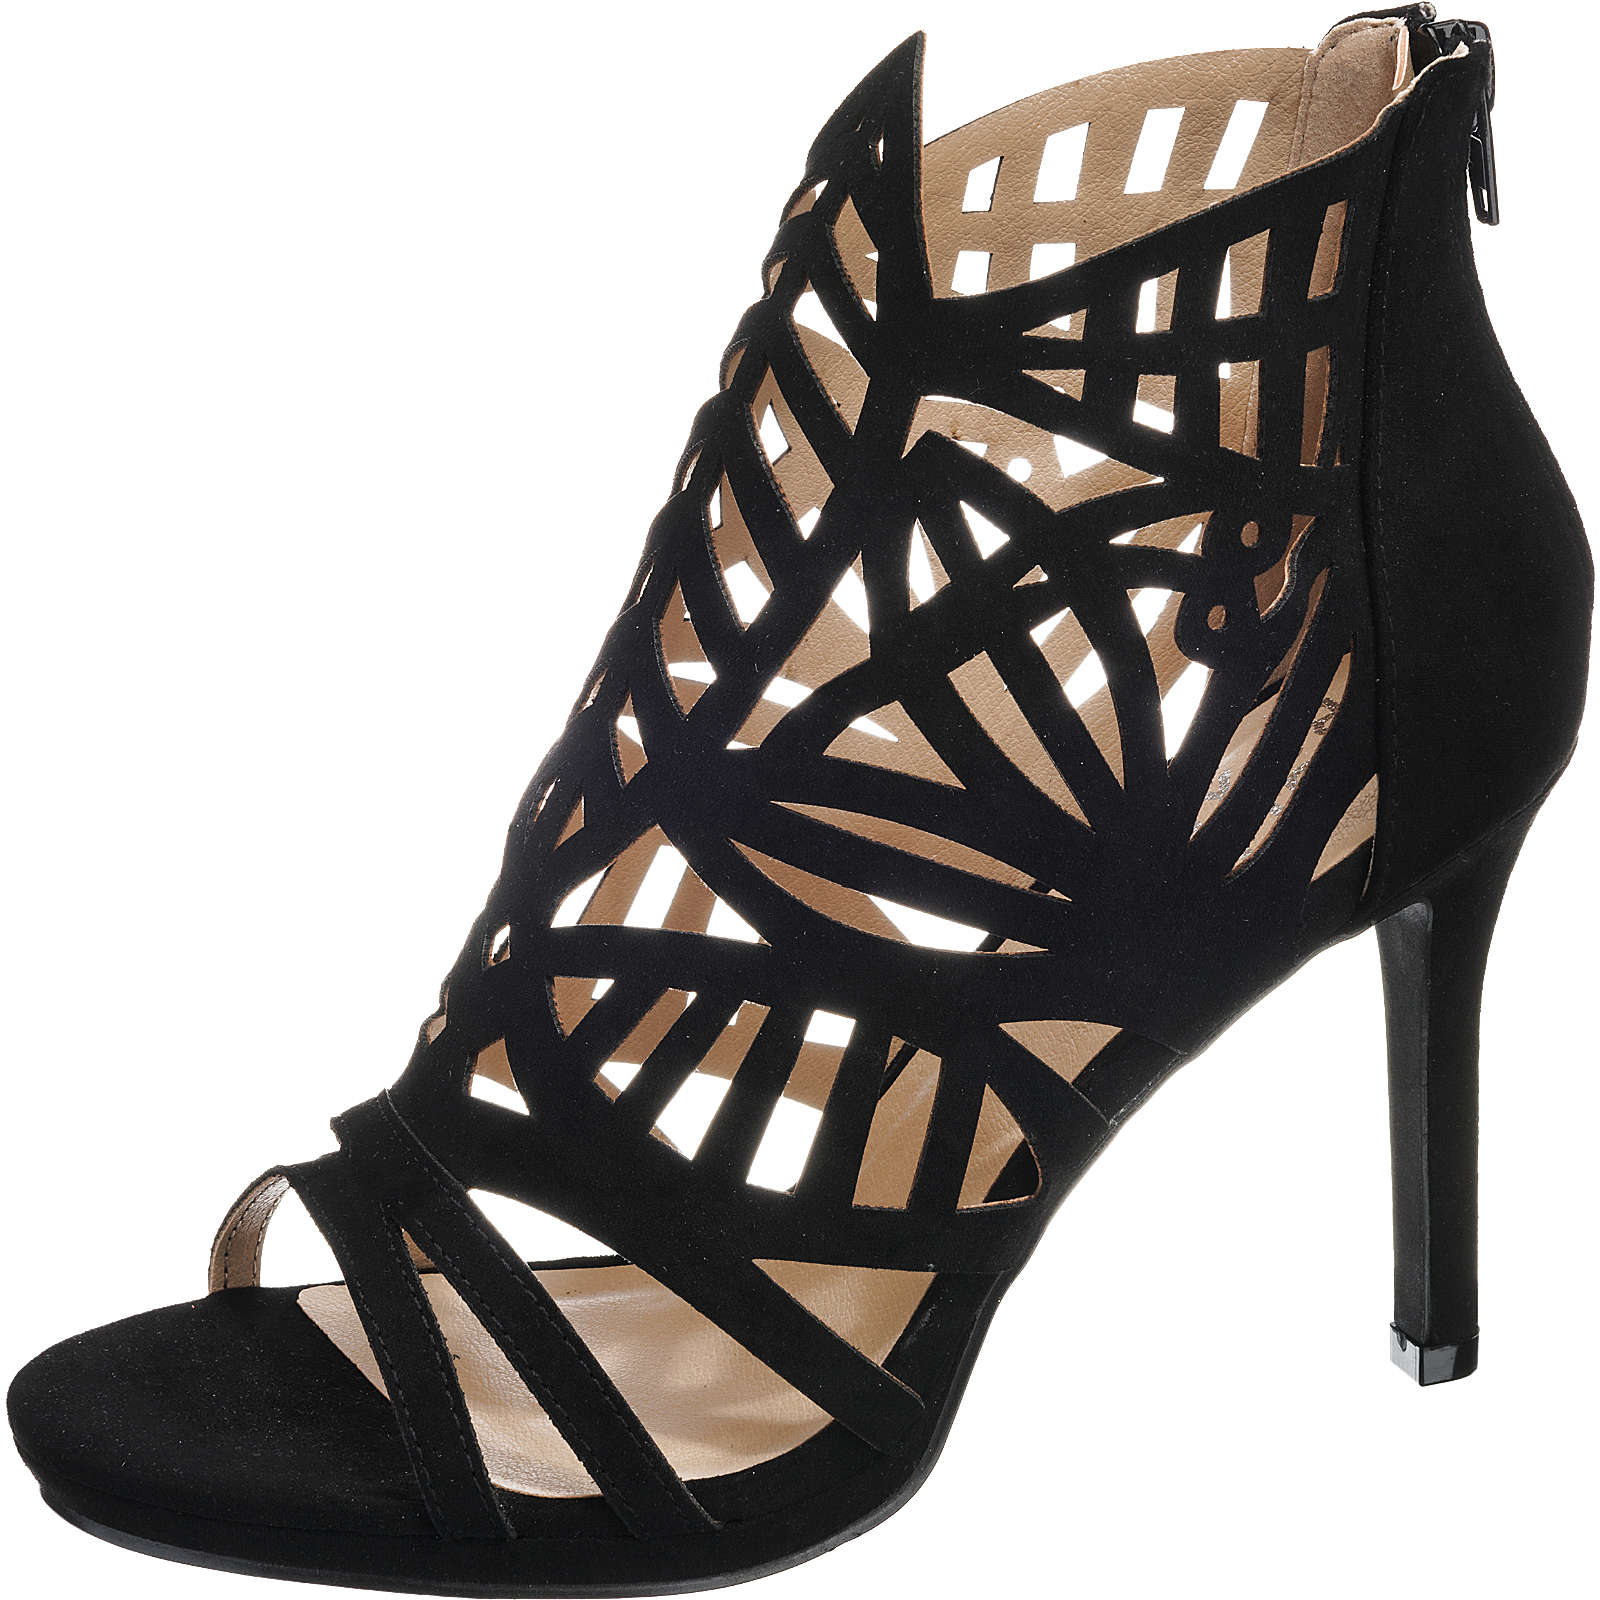 BULLBOXER Klassische Sandaletten schwarz Damen Gr. 37